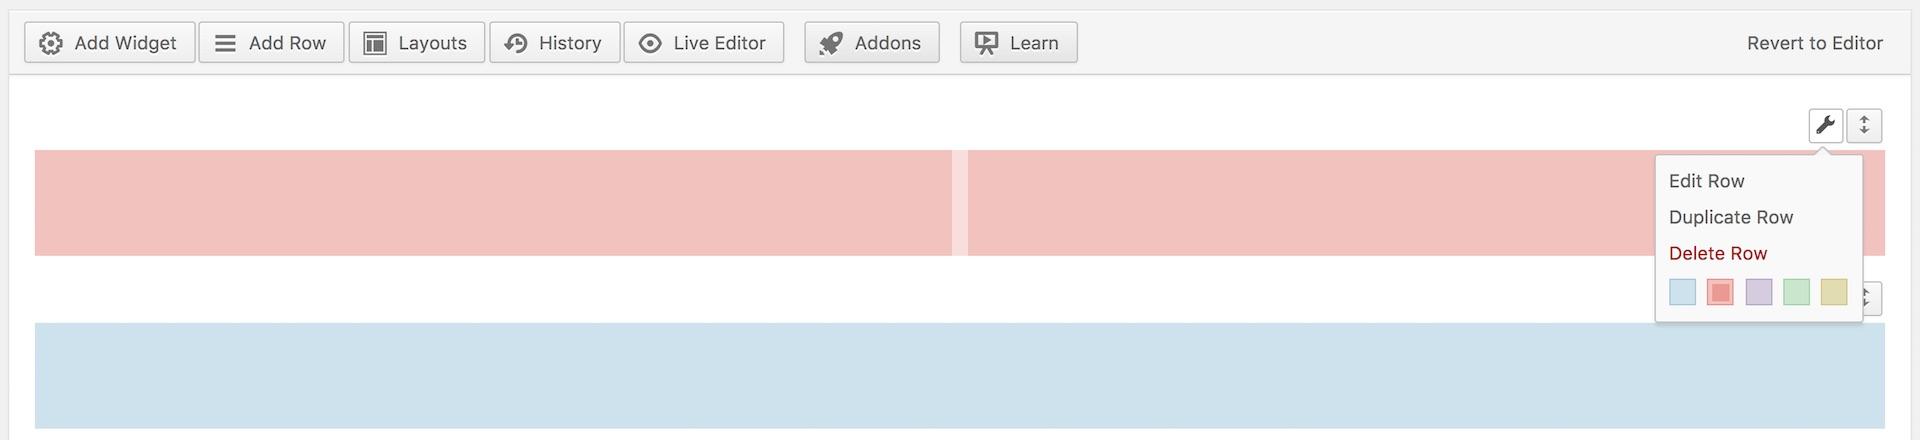 SiteOrigin Page Builder Row Color Labels